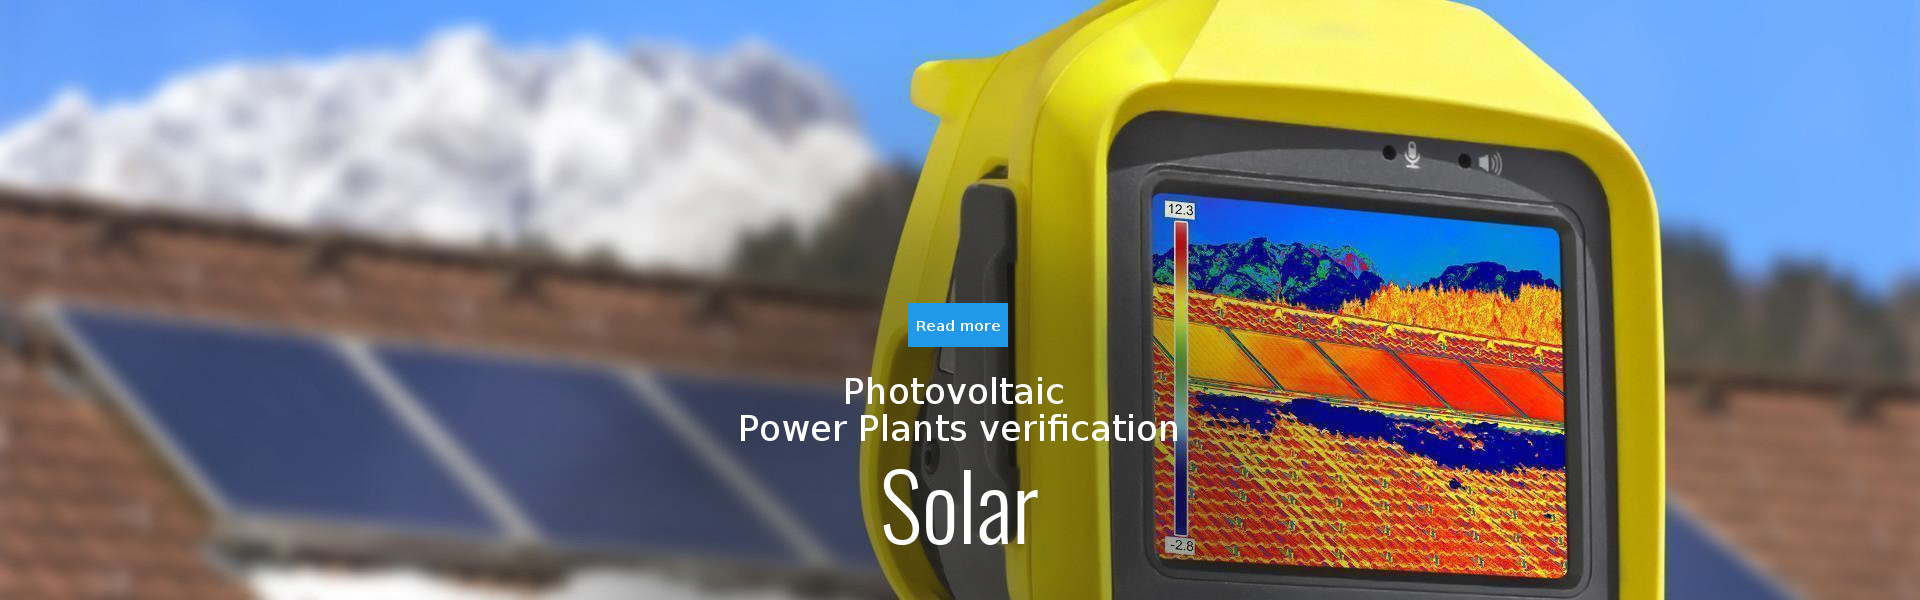 Photovoltaic POWER PLANTS verification